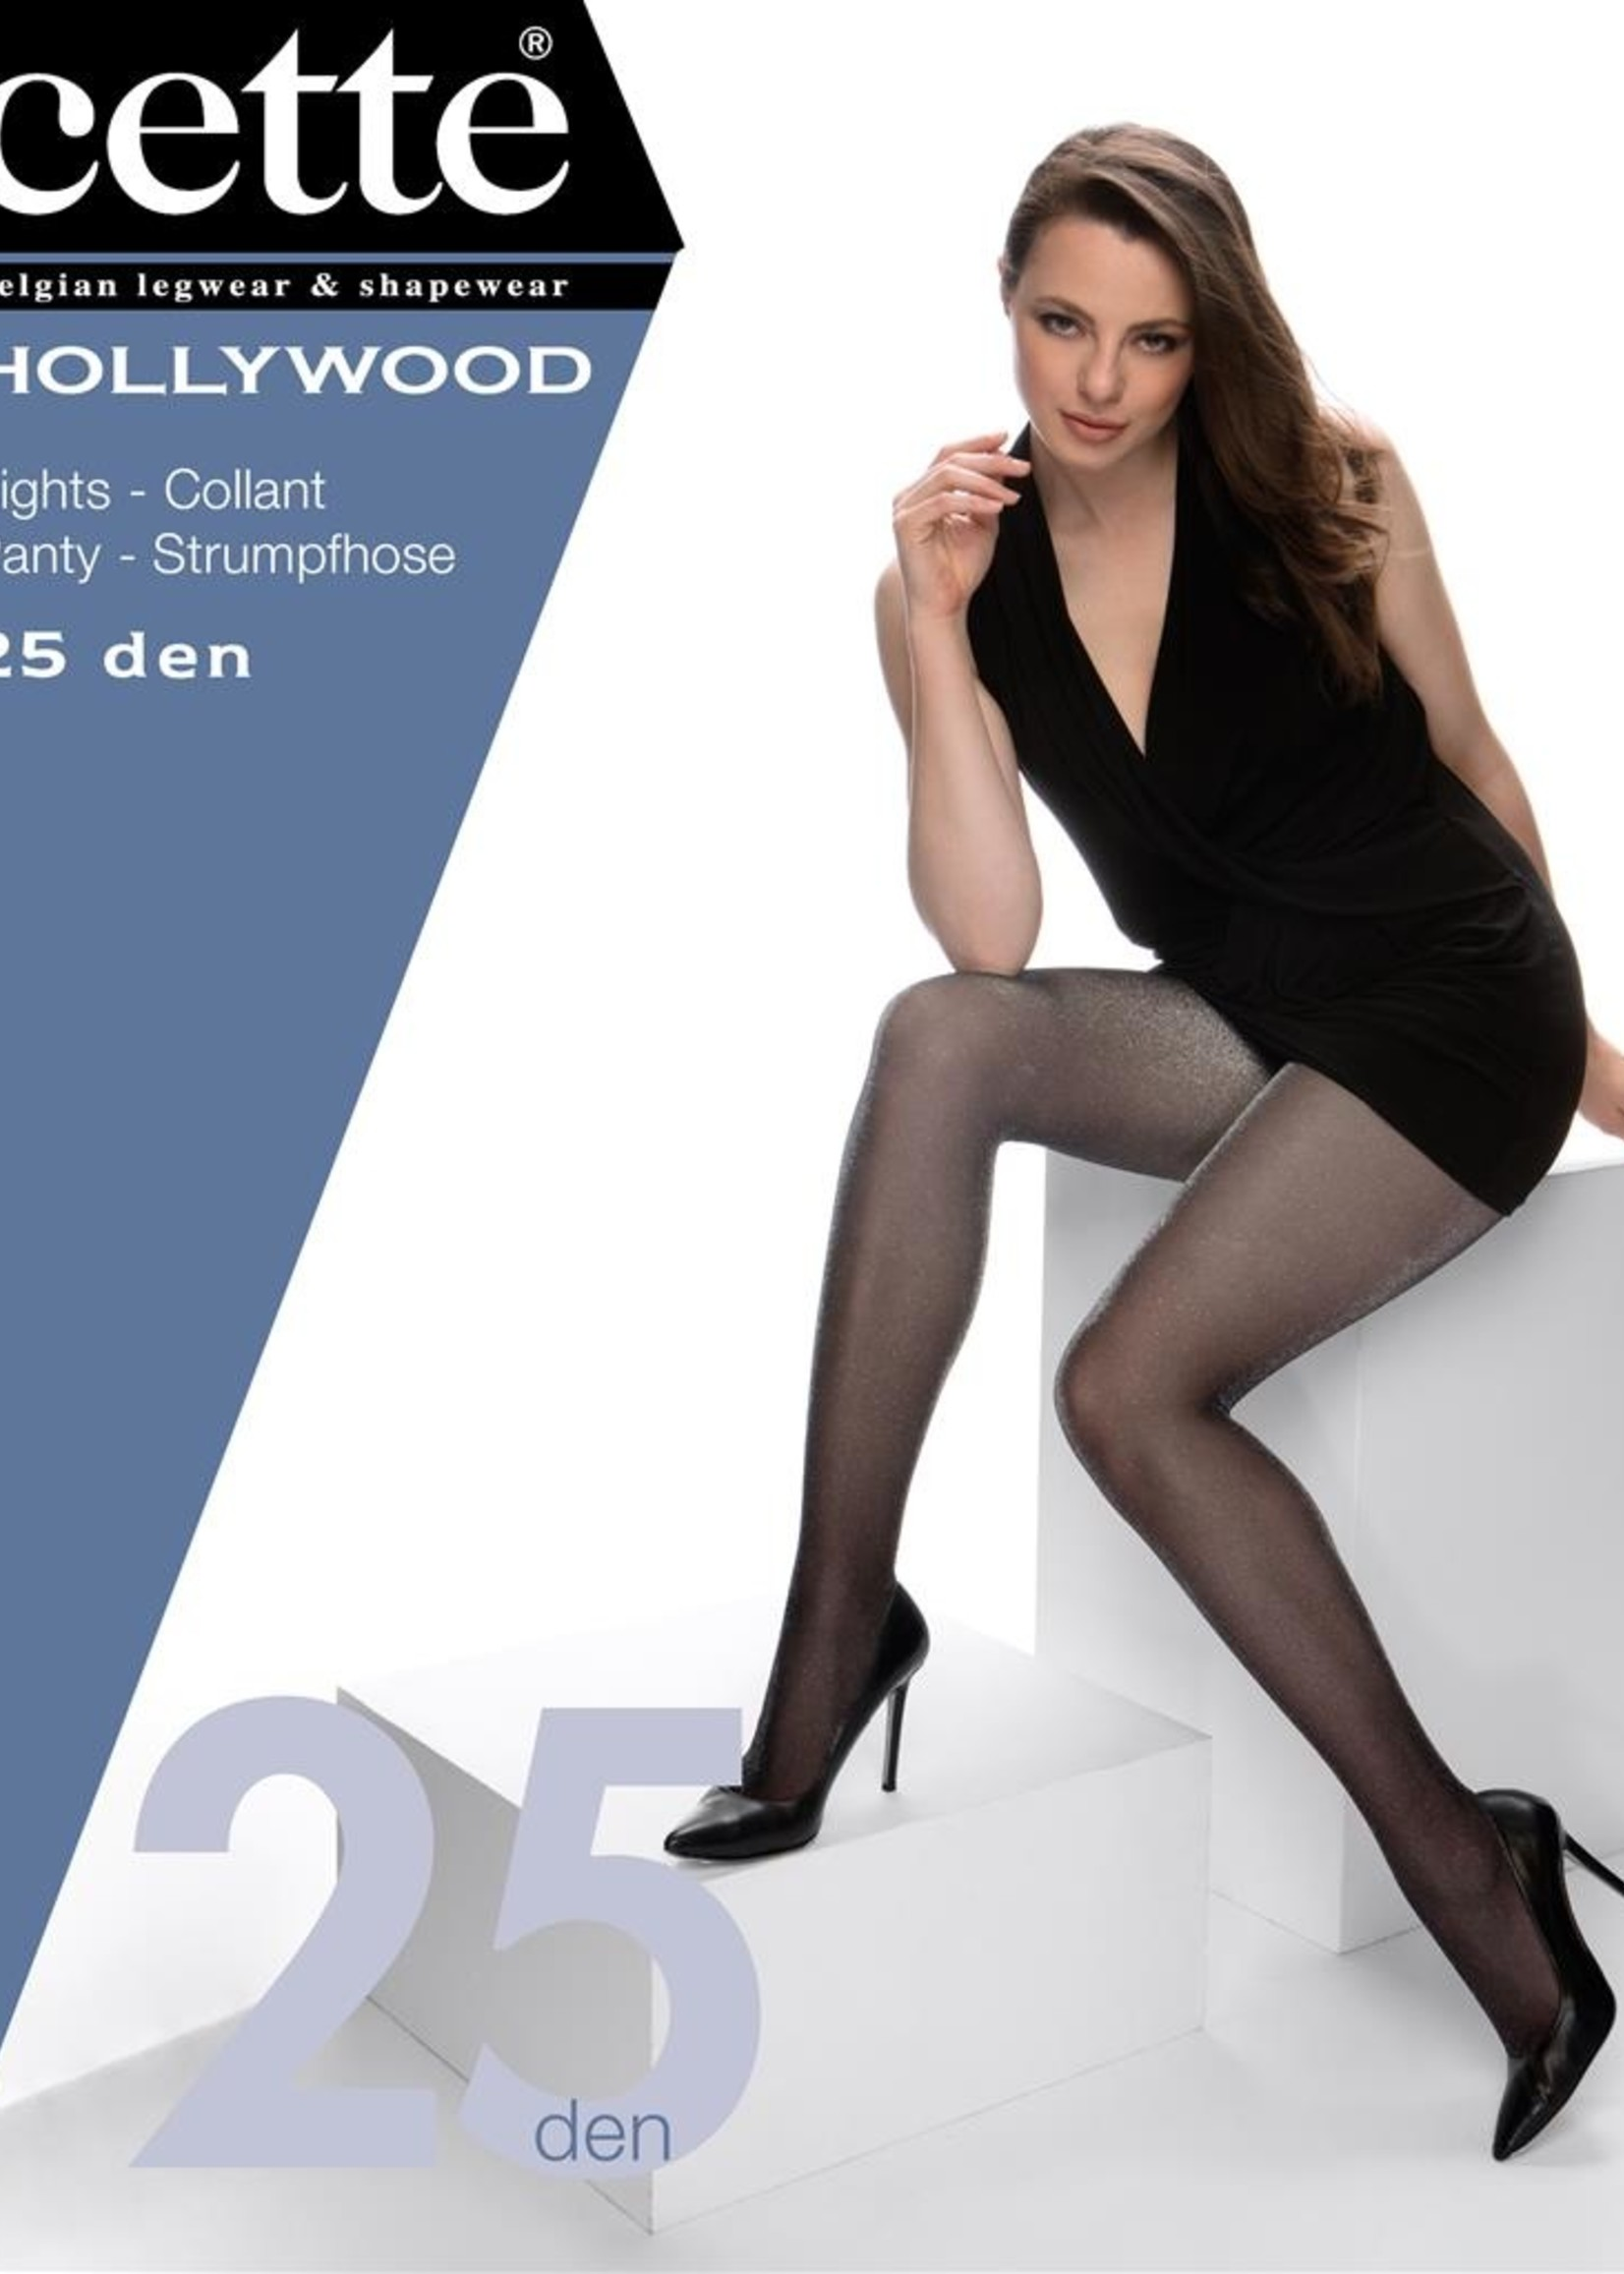 Cette Cette Hollywood Panty